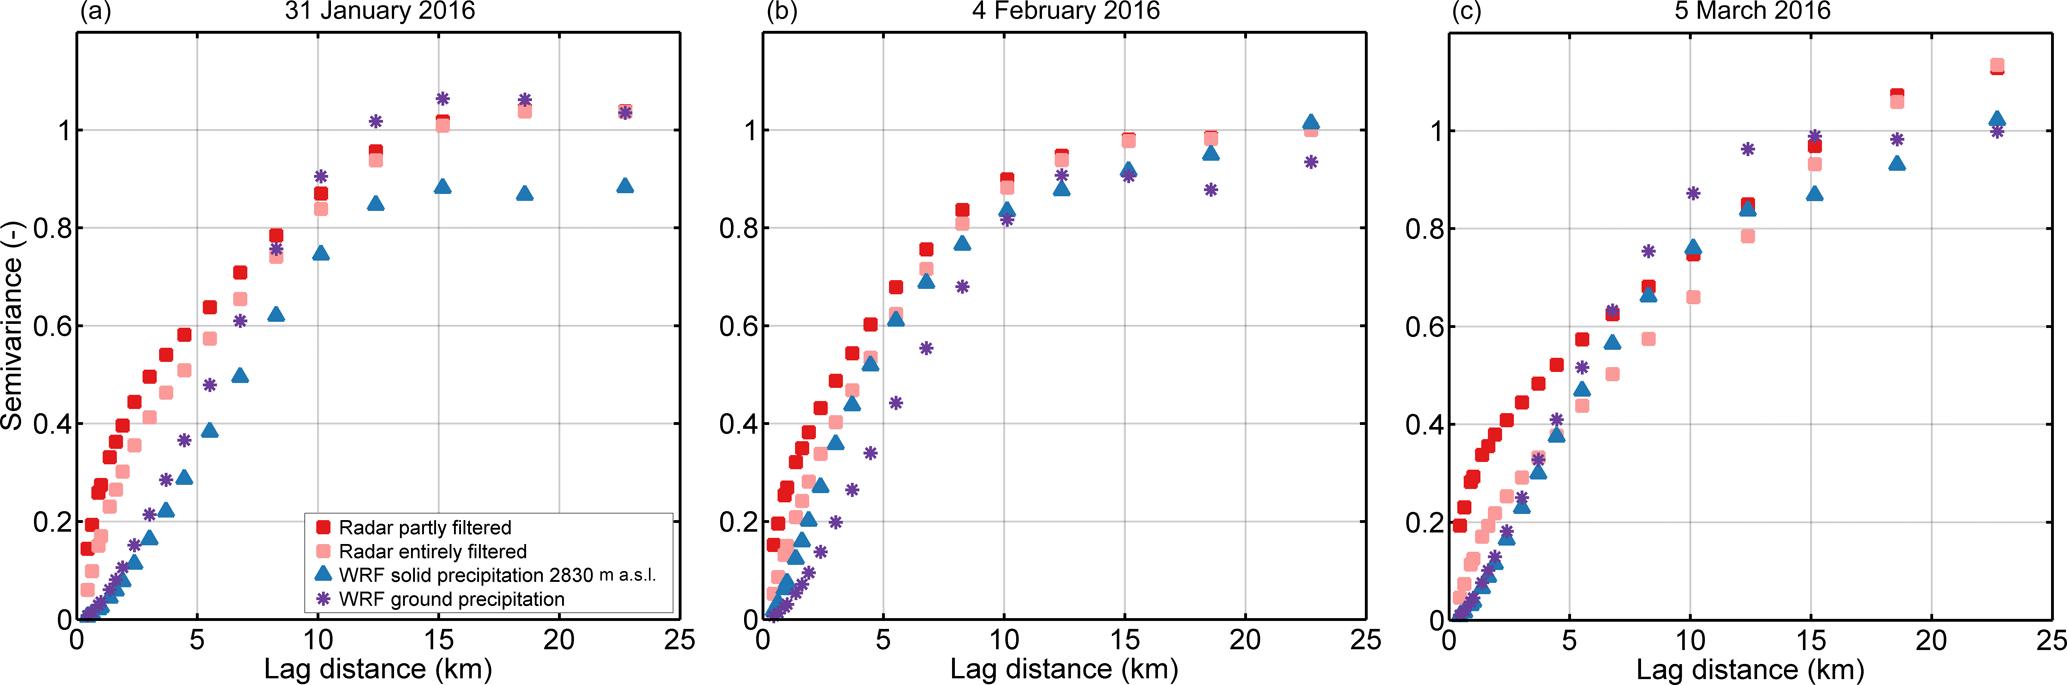 TC - Spatial variability in snow precipitation and